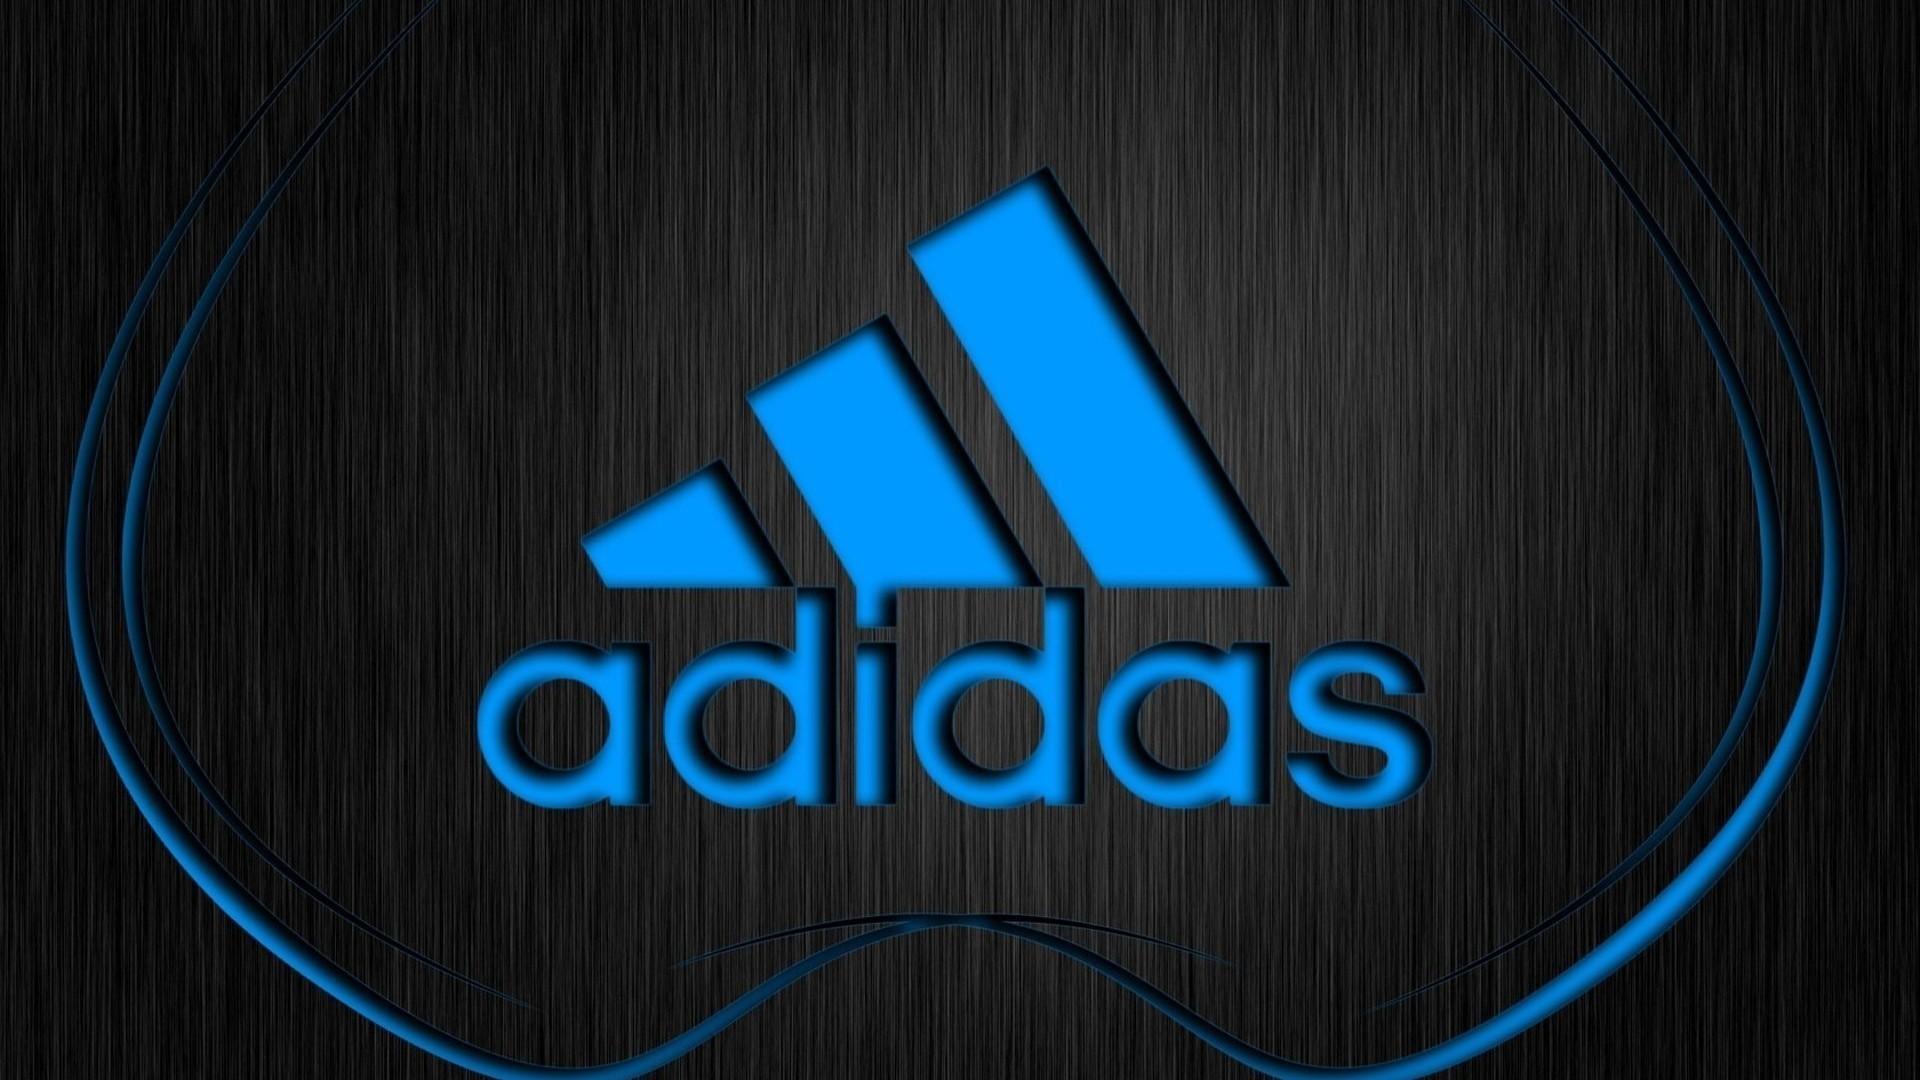 Res: 1920x1080, adidas brand logo wallpaper 1080p resolution